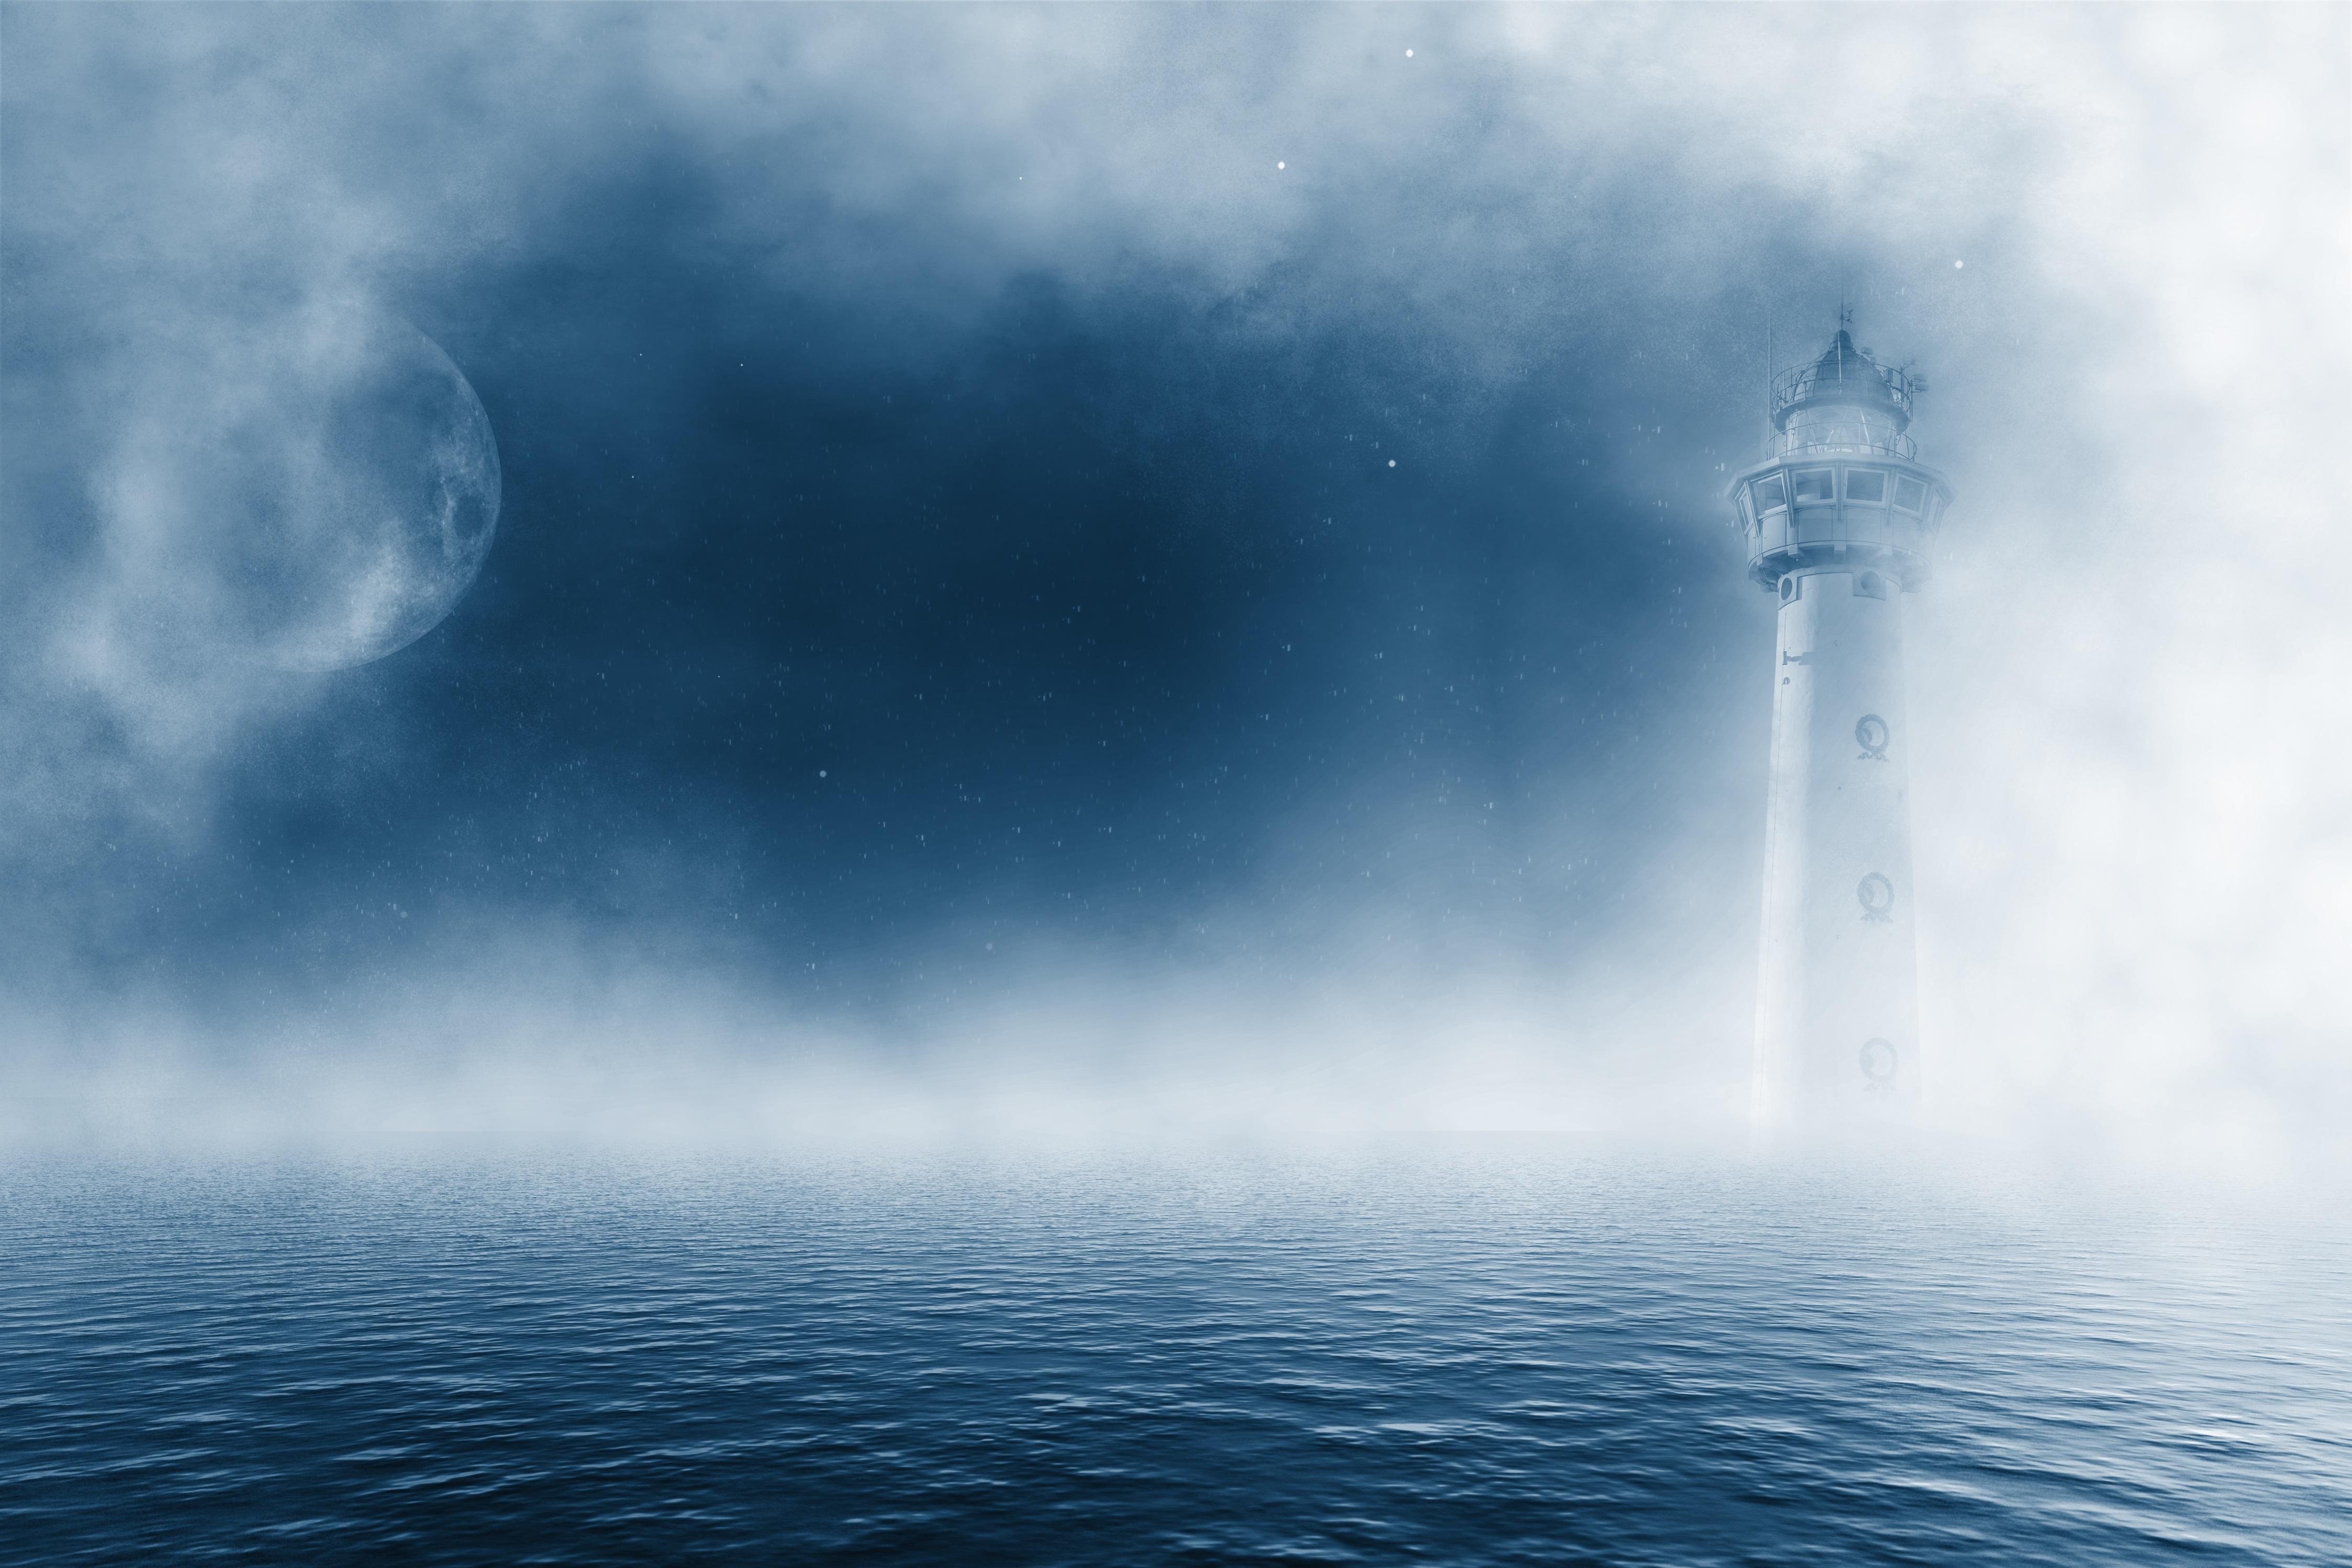 95009 скачать обои Природа, Маяк, Море, Туман, Облака - заставки и картинки бесплатно